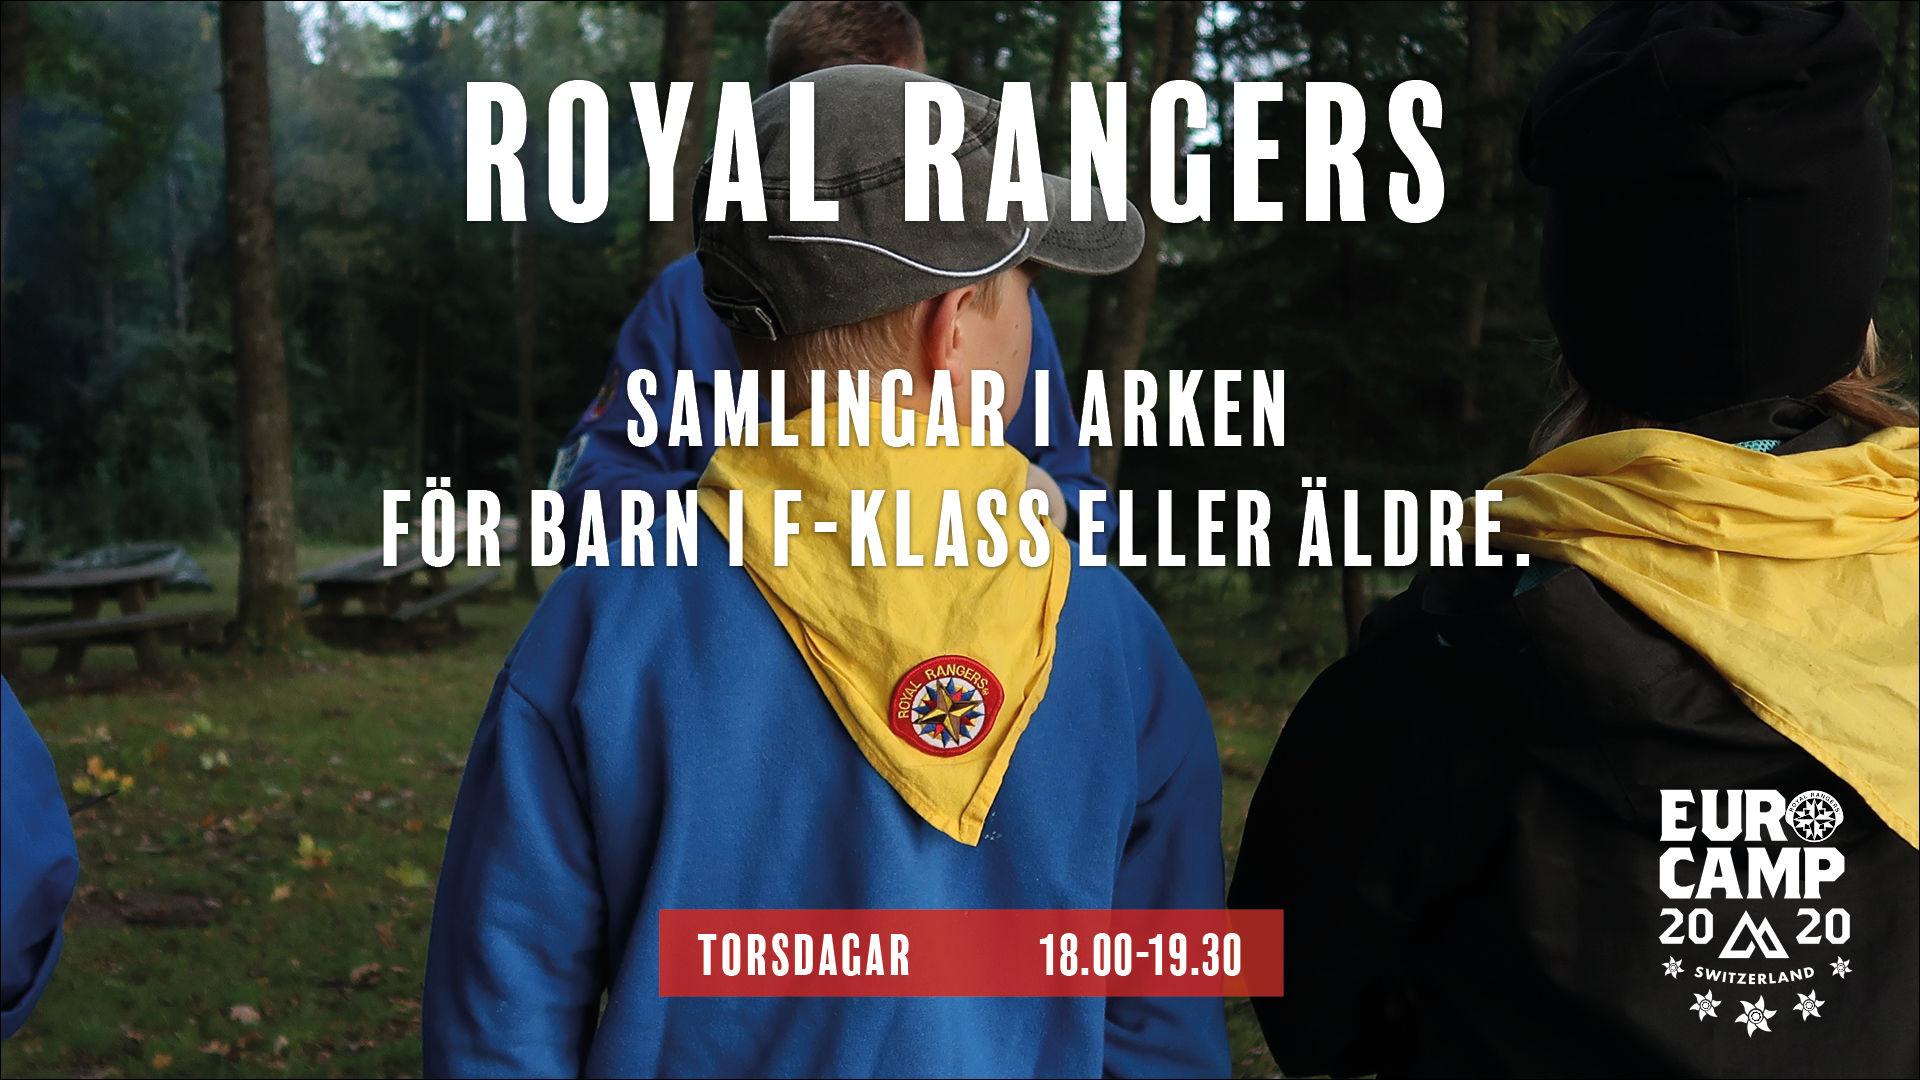 royal-rangers-eurocamp